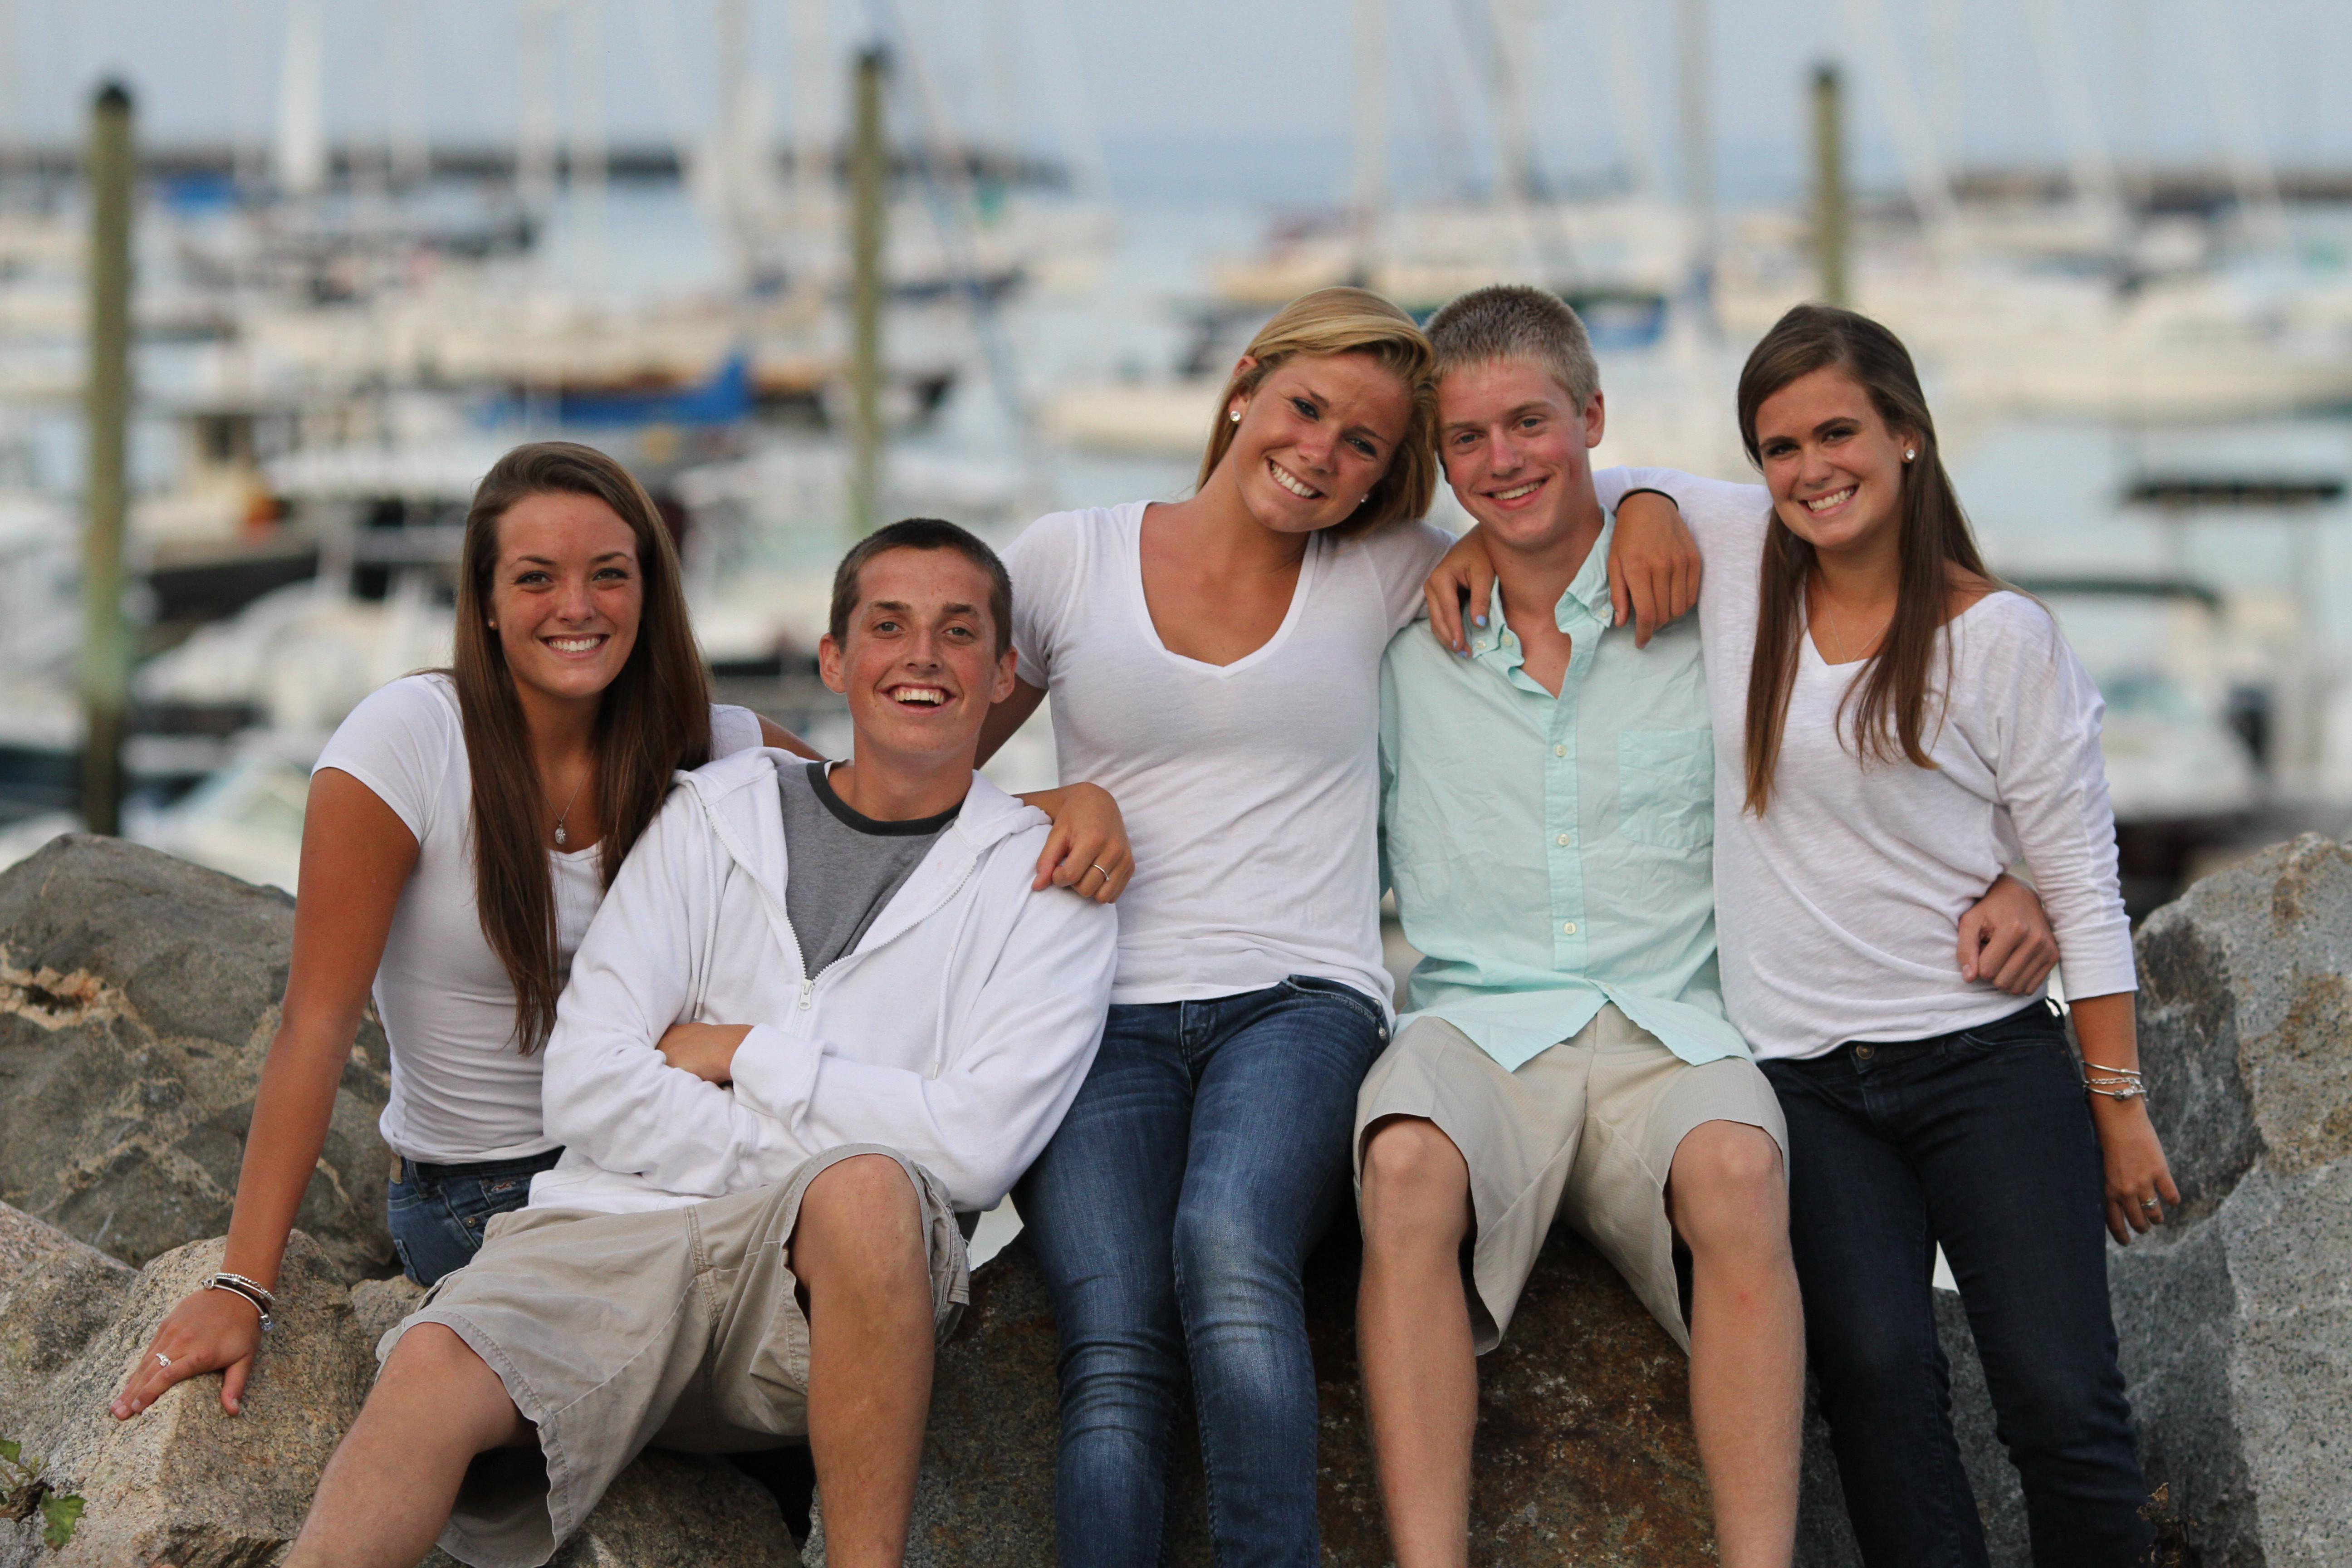 Senior Portrait add in family/friends